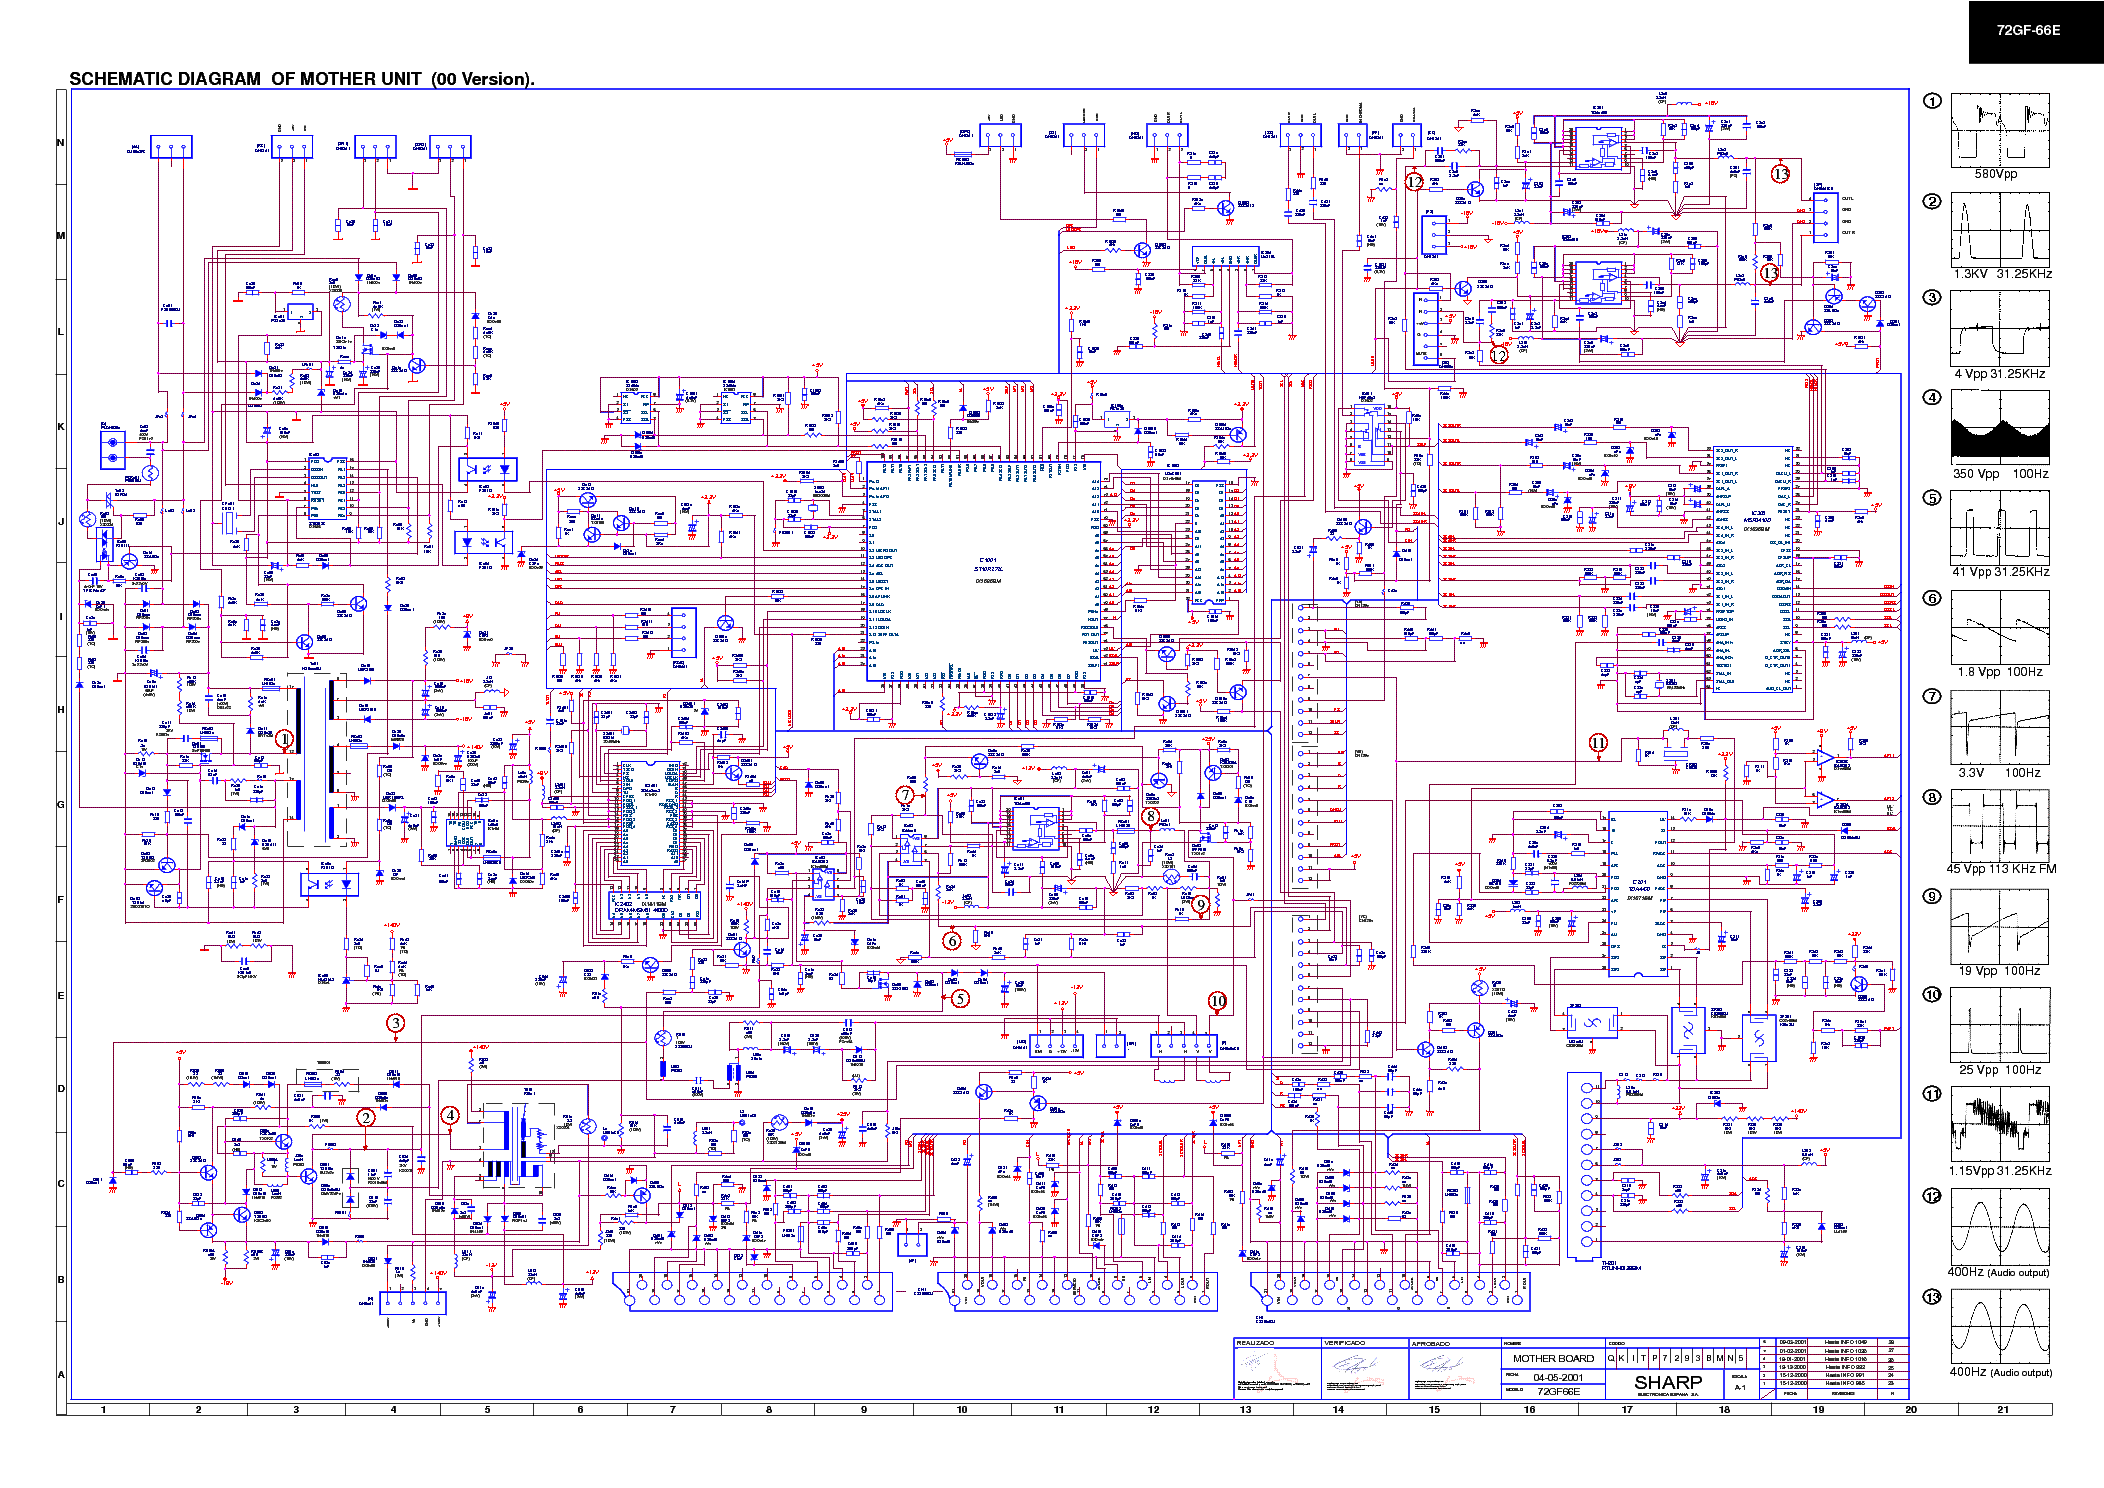 Схема блоков питания телевизора тошиба